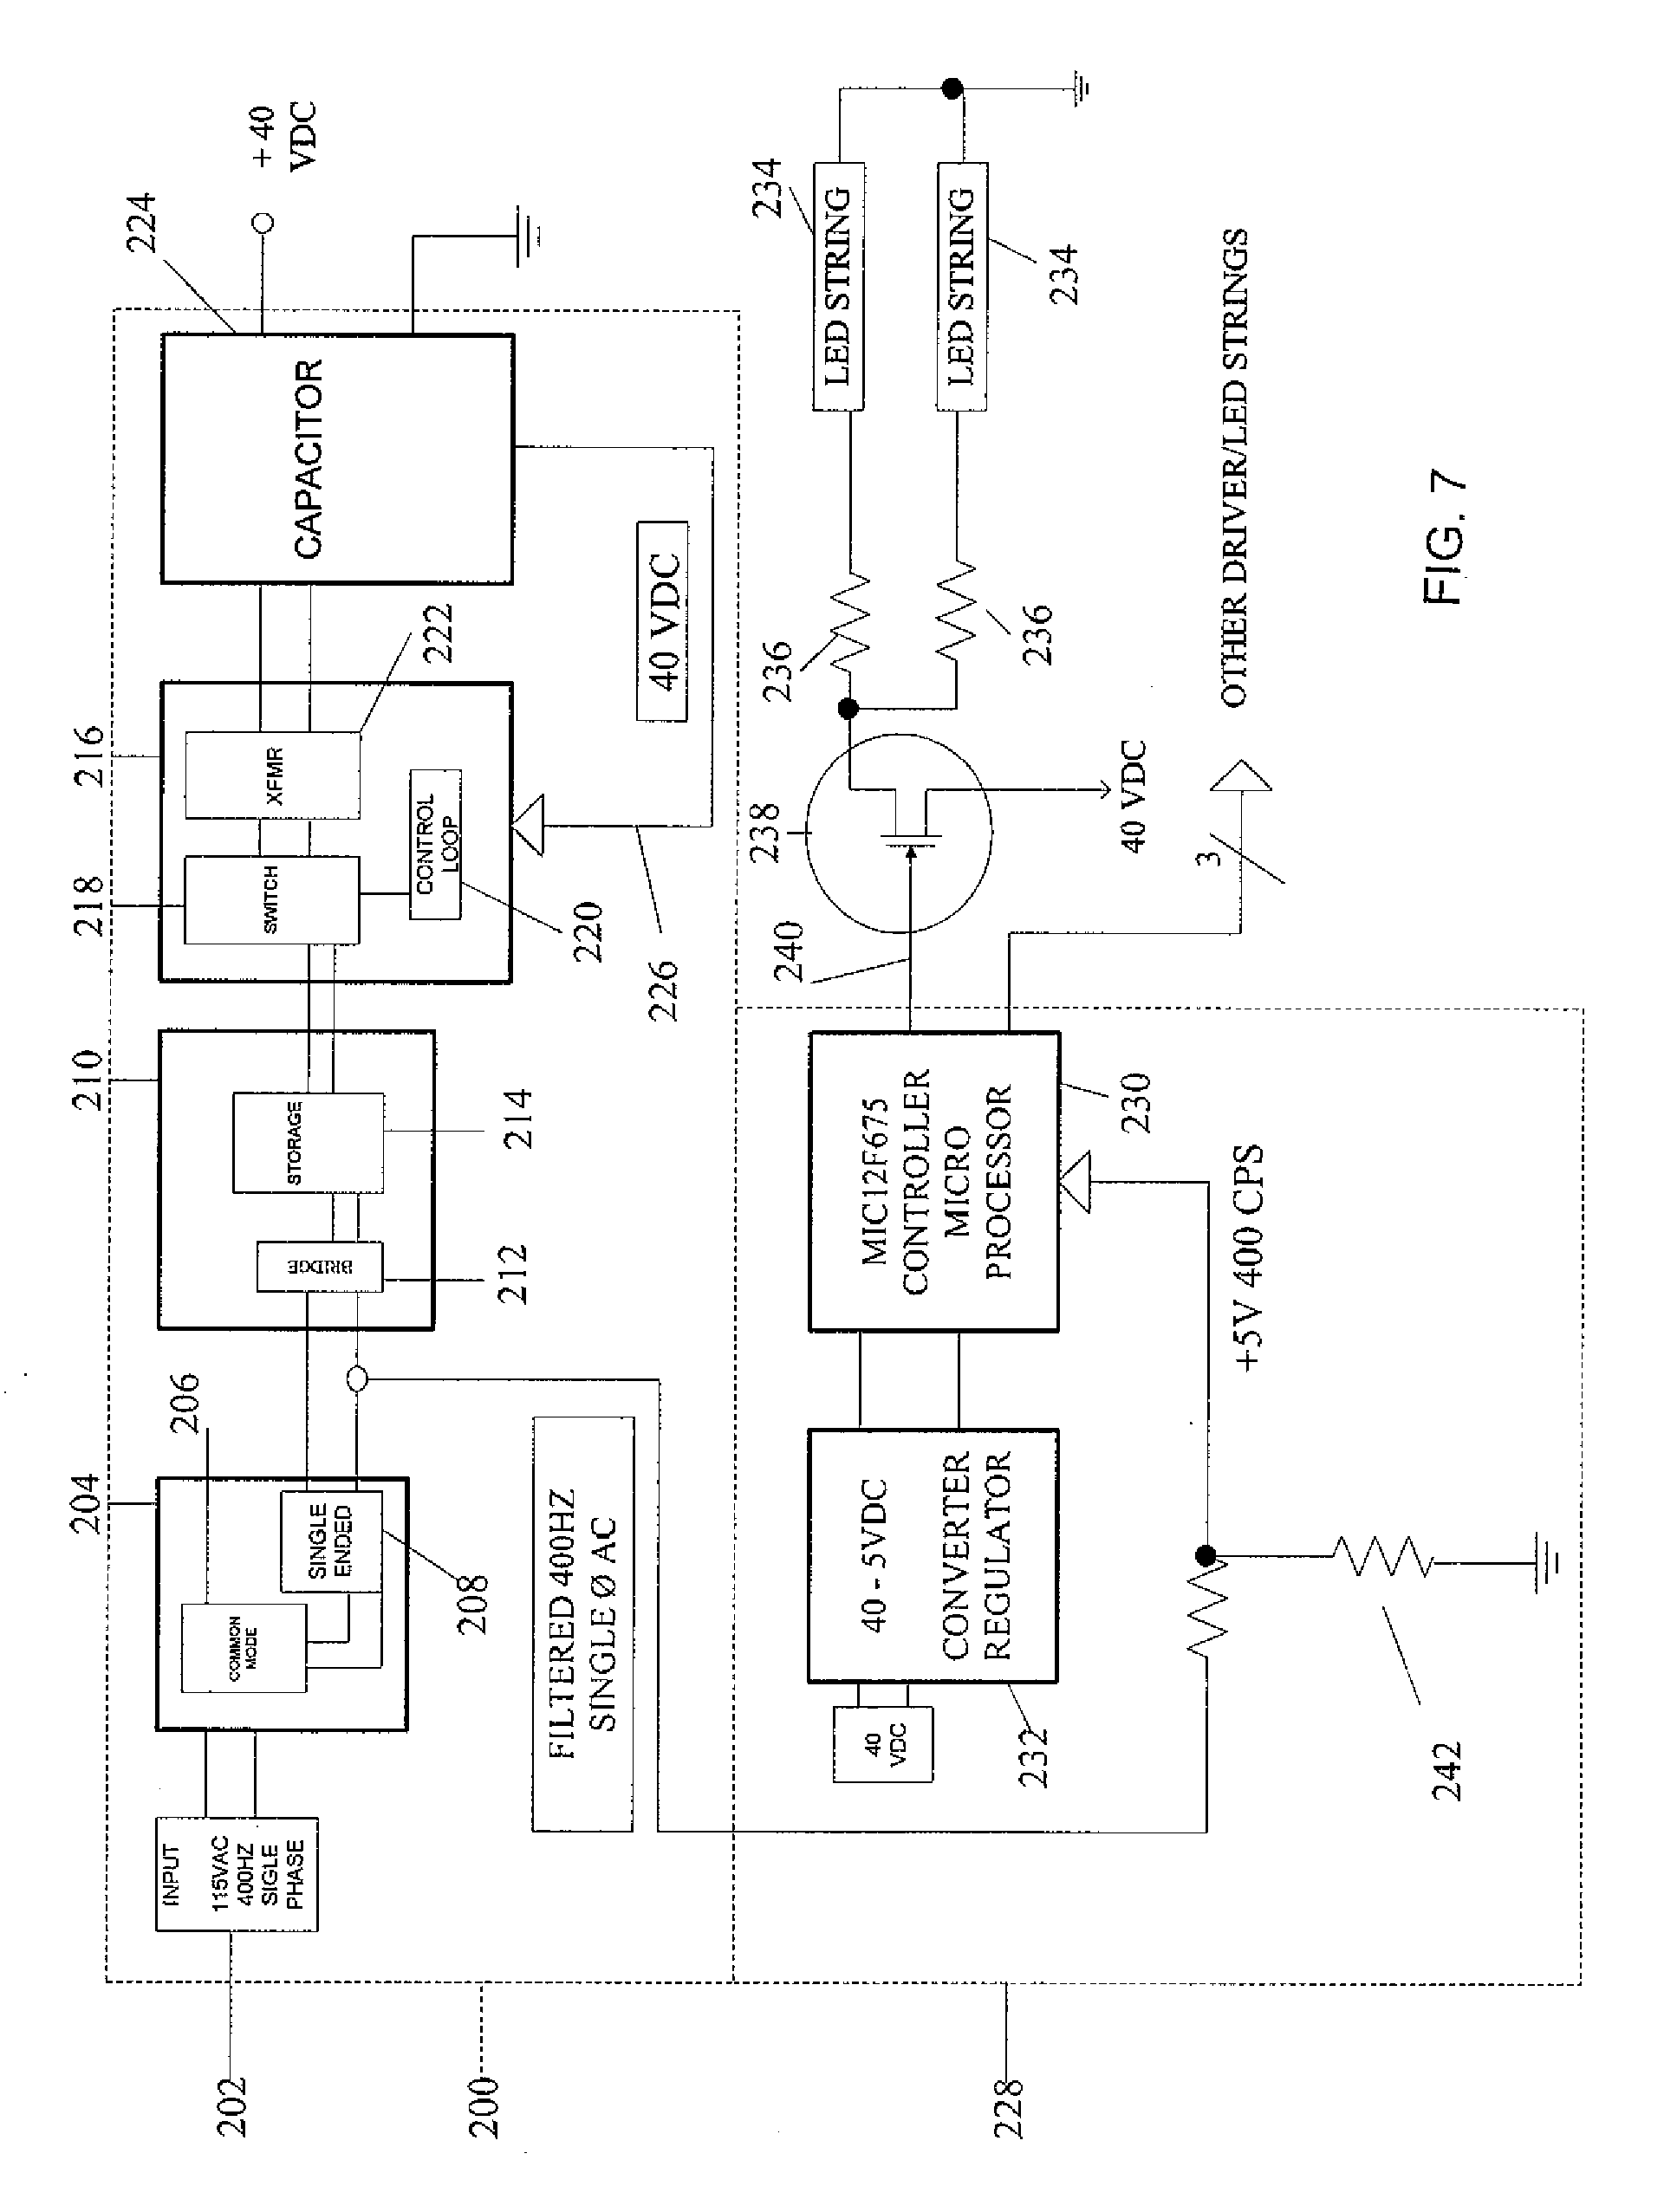 Anti Collision Diagram For Wiring : 33 Wiring Diagram